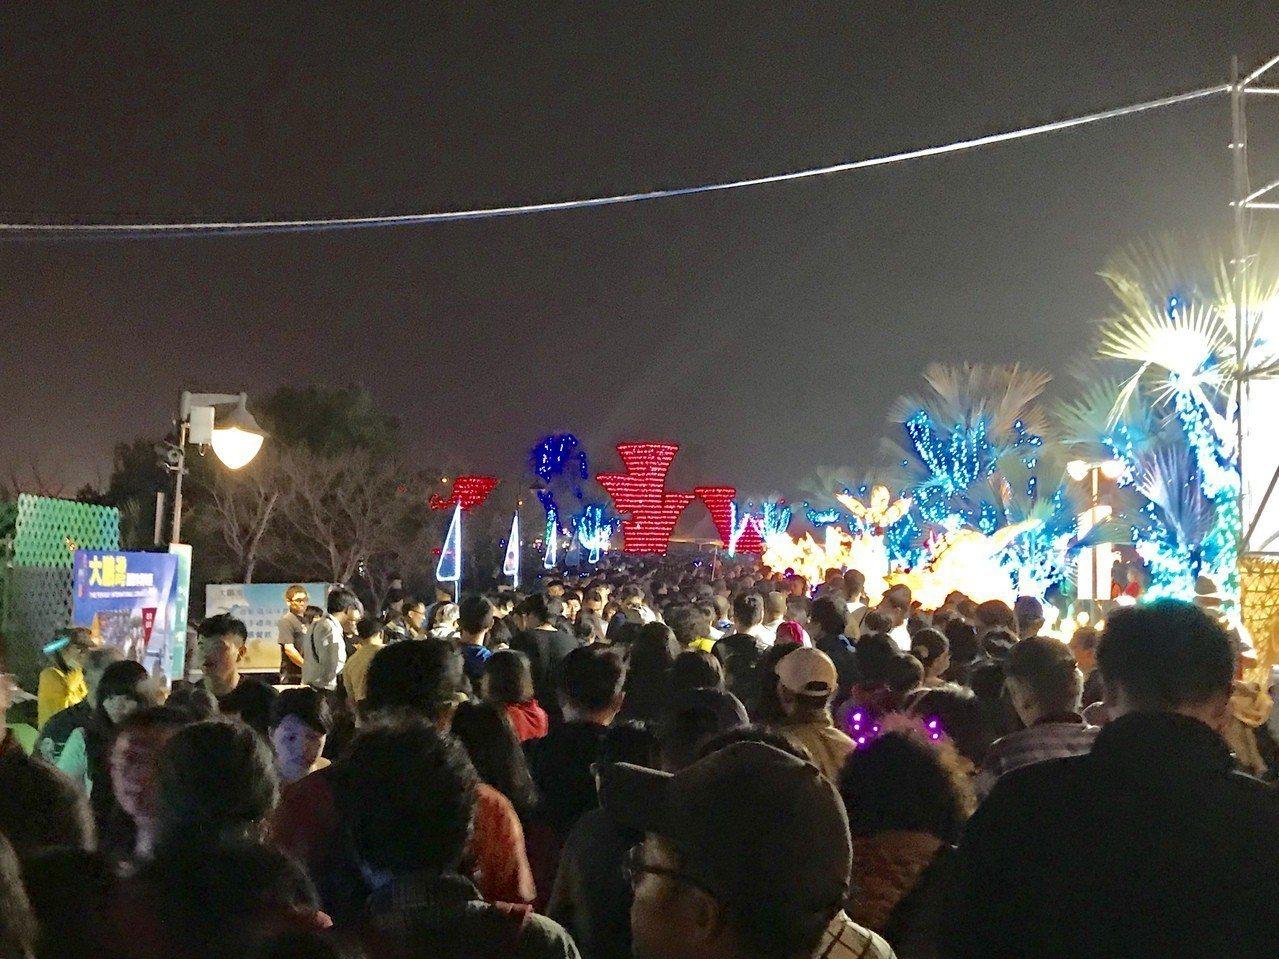 intel無人機表演結束後,民眾陸續離場。記者江國豪/攝影